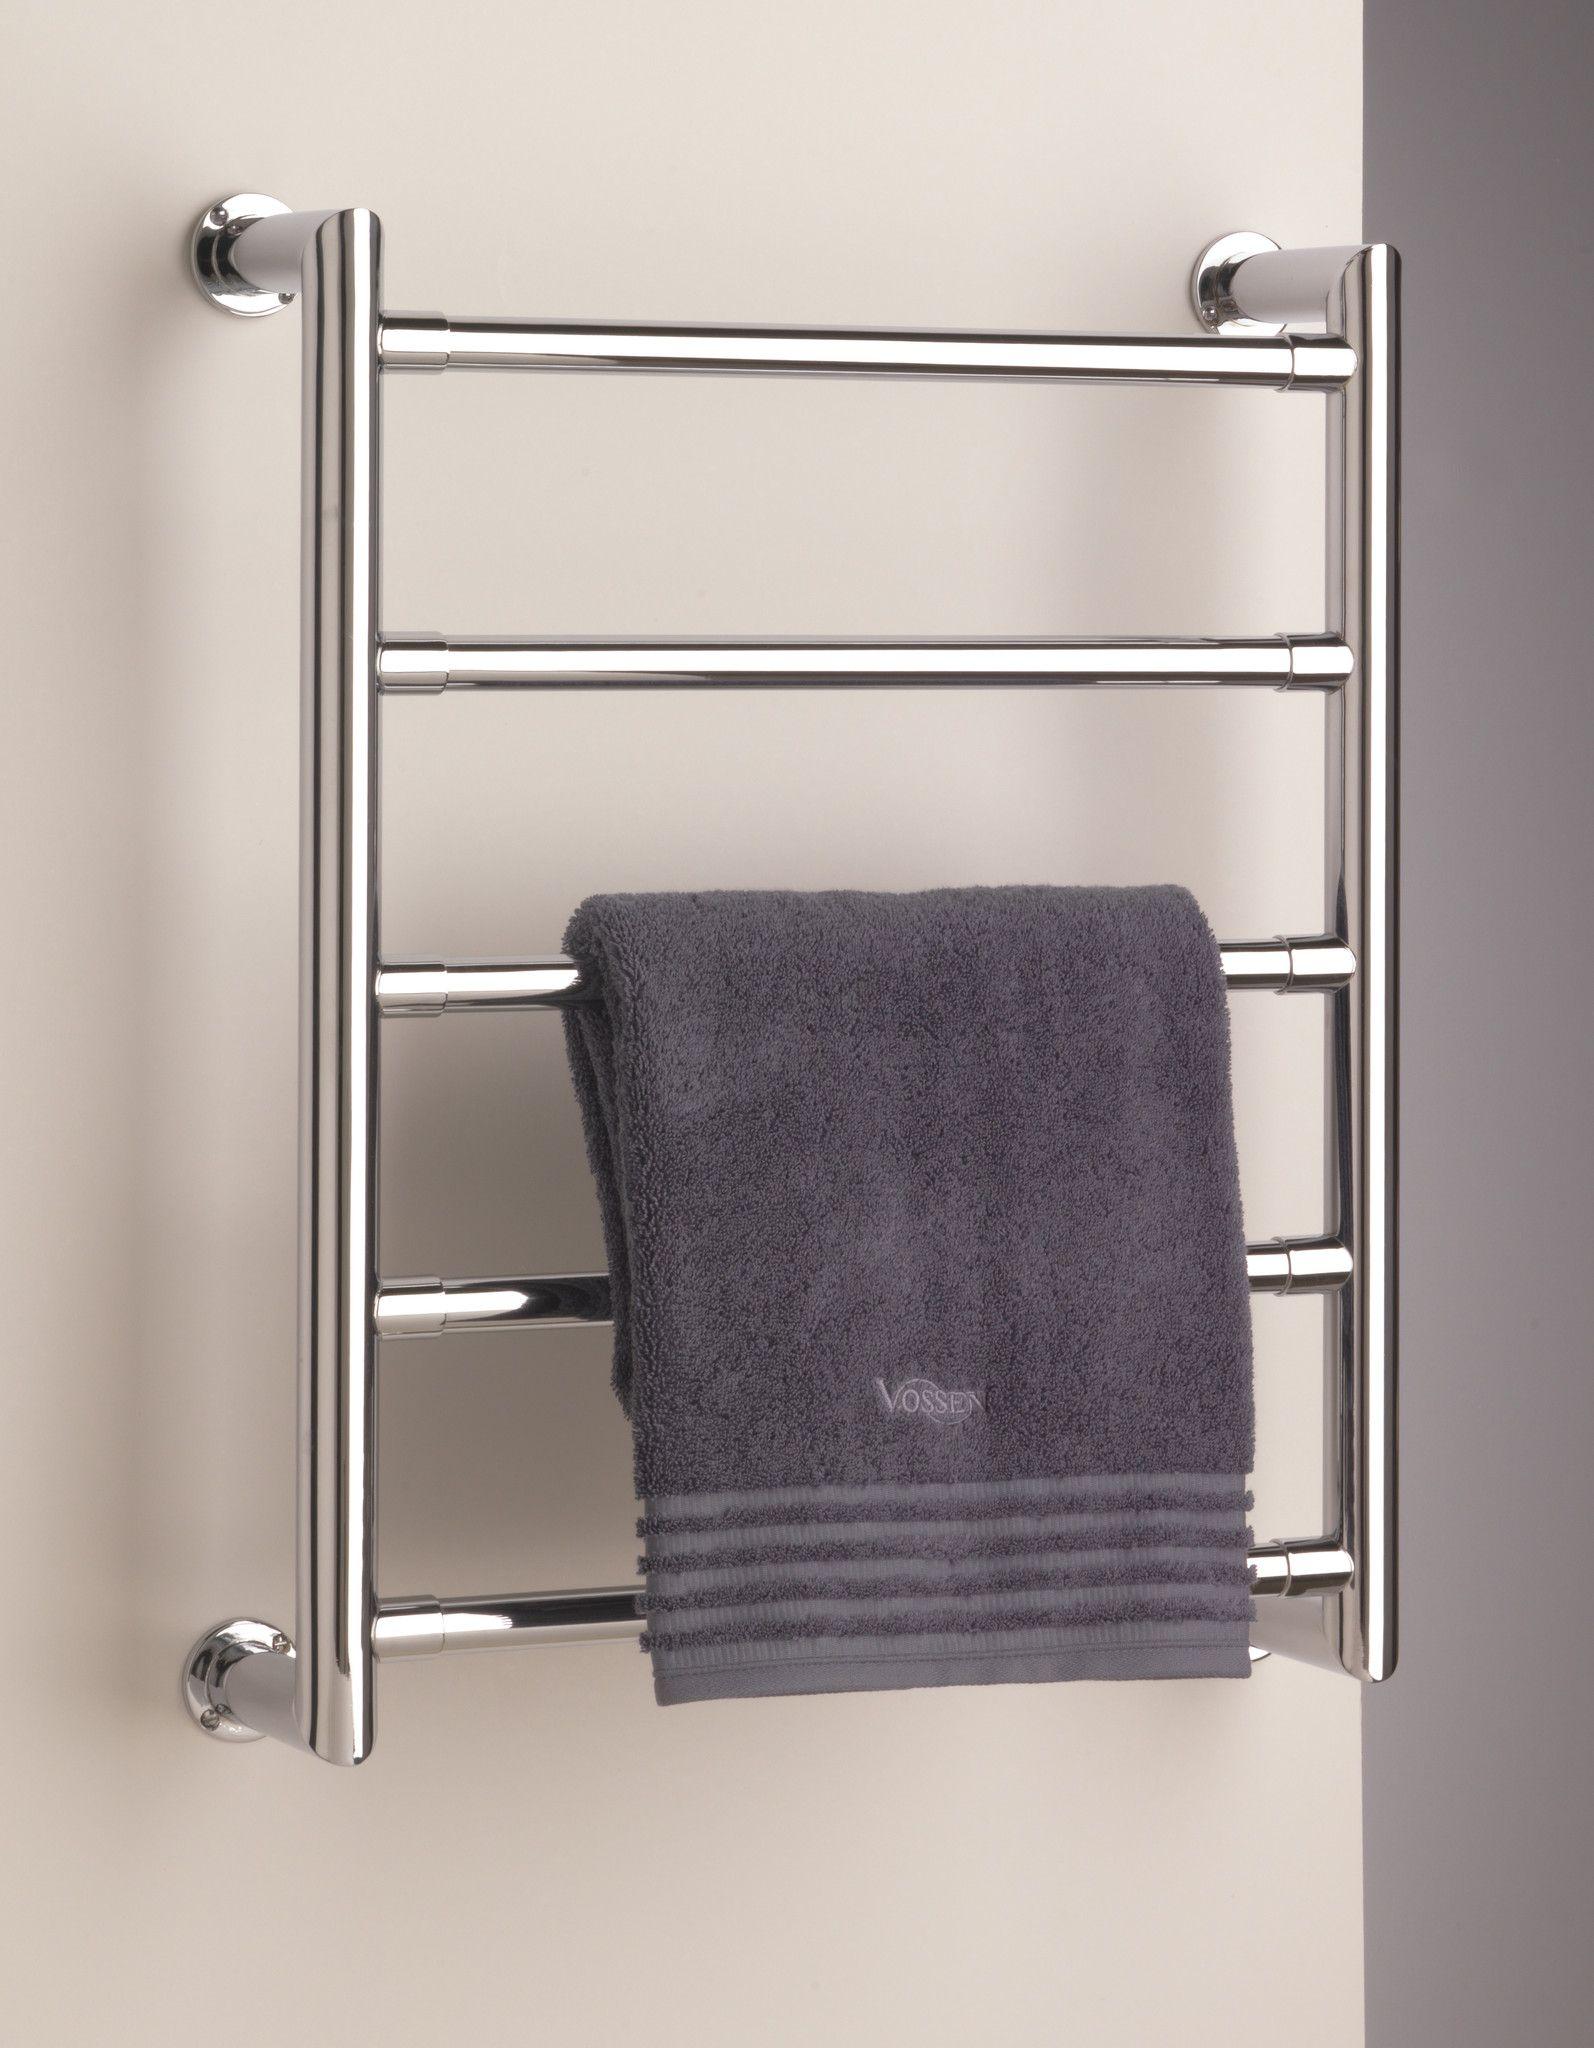 Sterlingham Tura Wall Mount Five Rail Towel Warmer 19 7 W X 24 4 H Heated Towel Rack Towel Rack Towel Rail